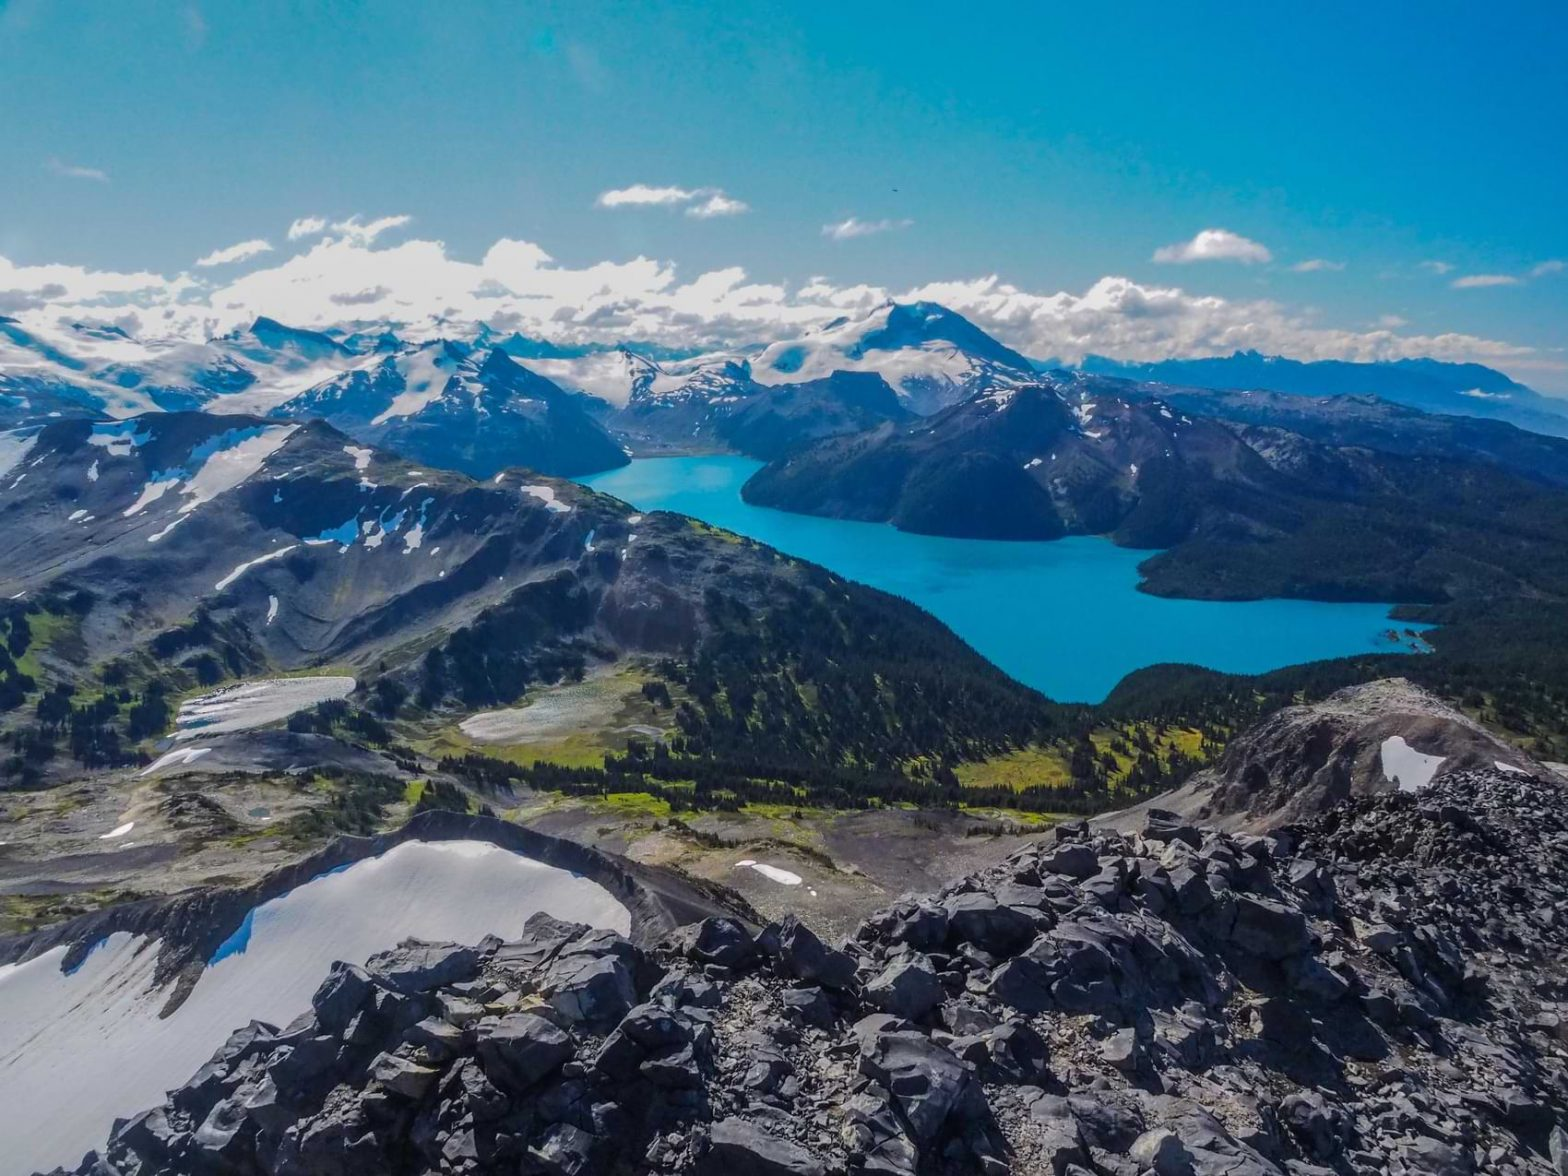 Garibaldi Lake in Whistler, B.C. shows off the town's stunning nature